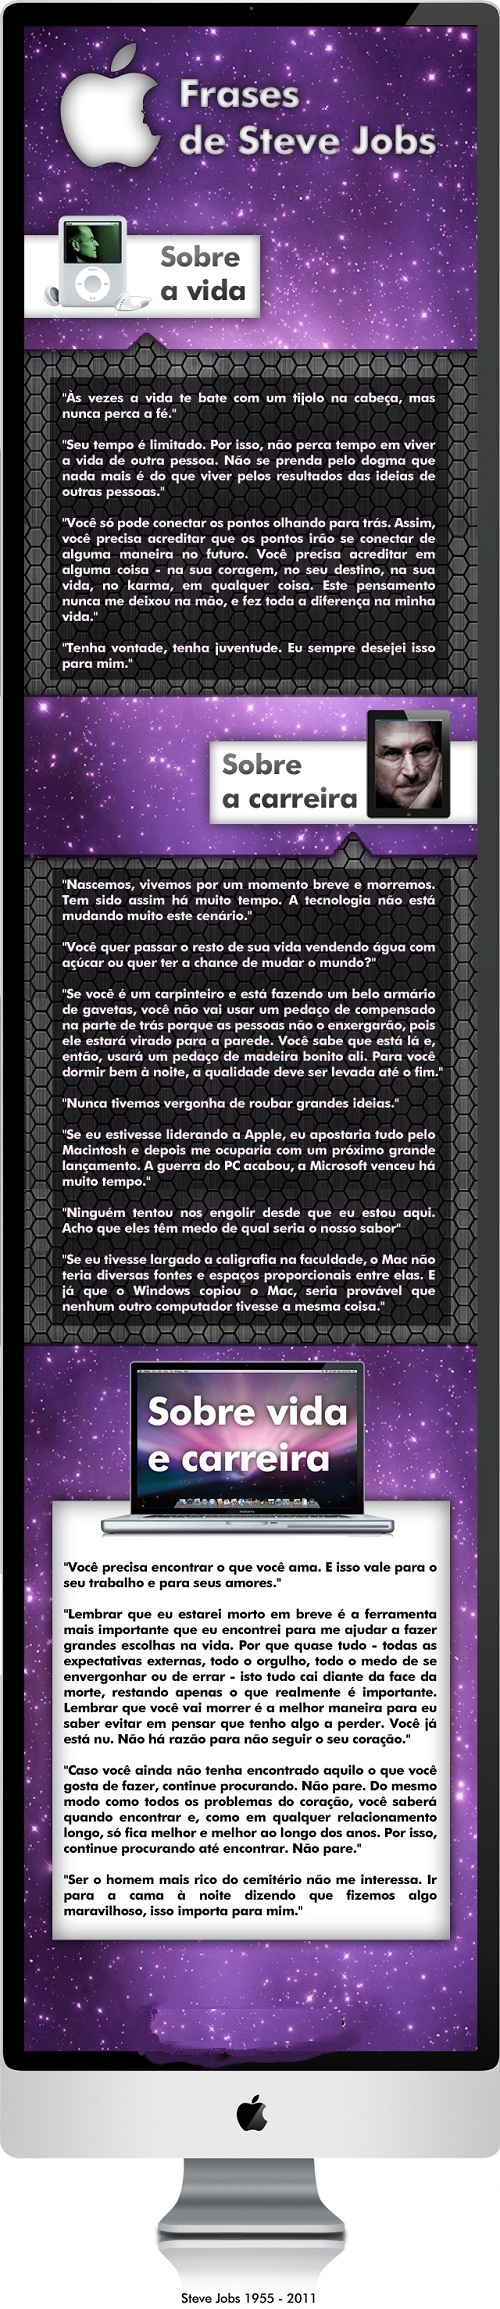 Frases memoráveis de Steve Jobs